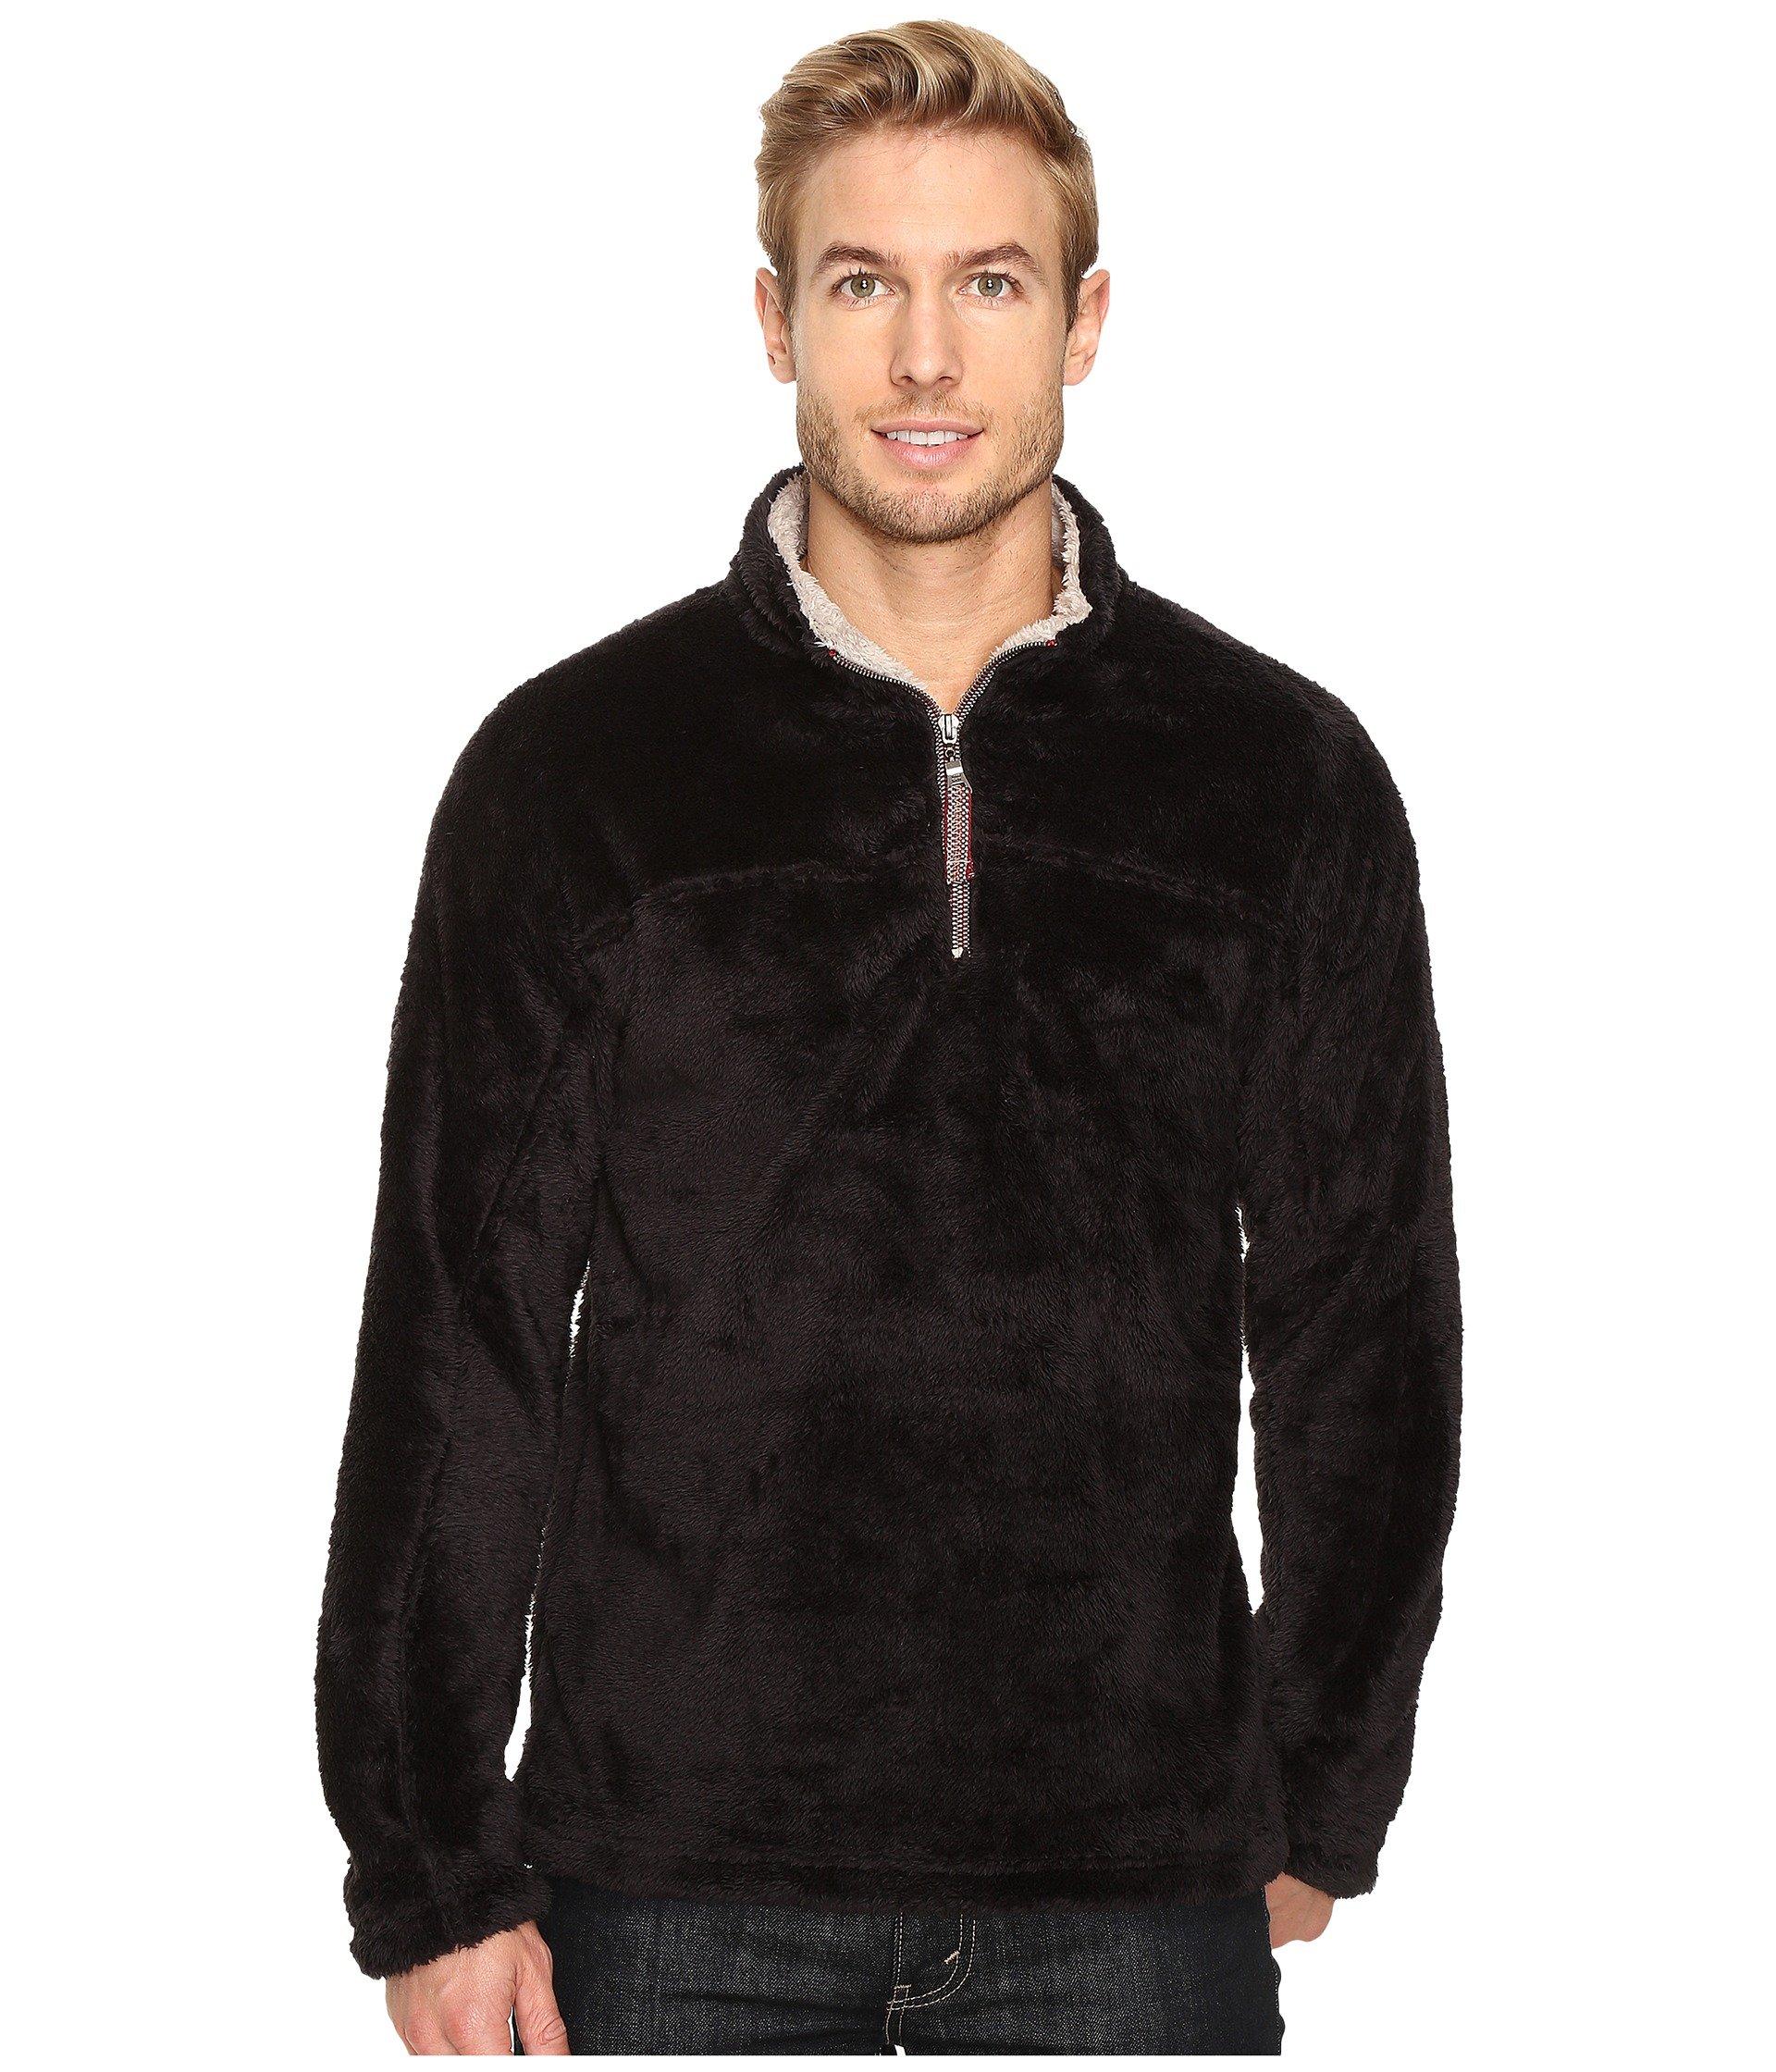 True 4 Double Black 1 Plush Pullover Grit Zip rxqISwrv